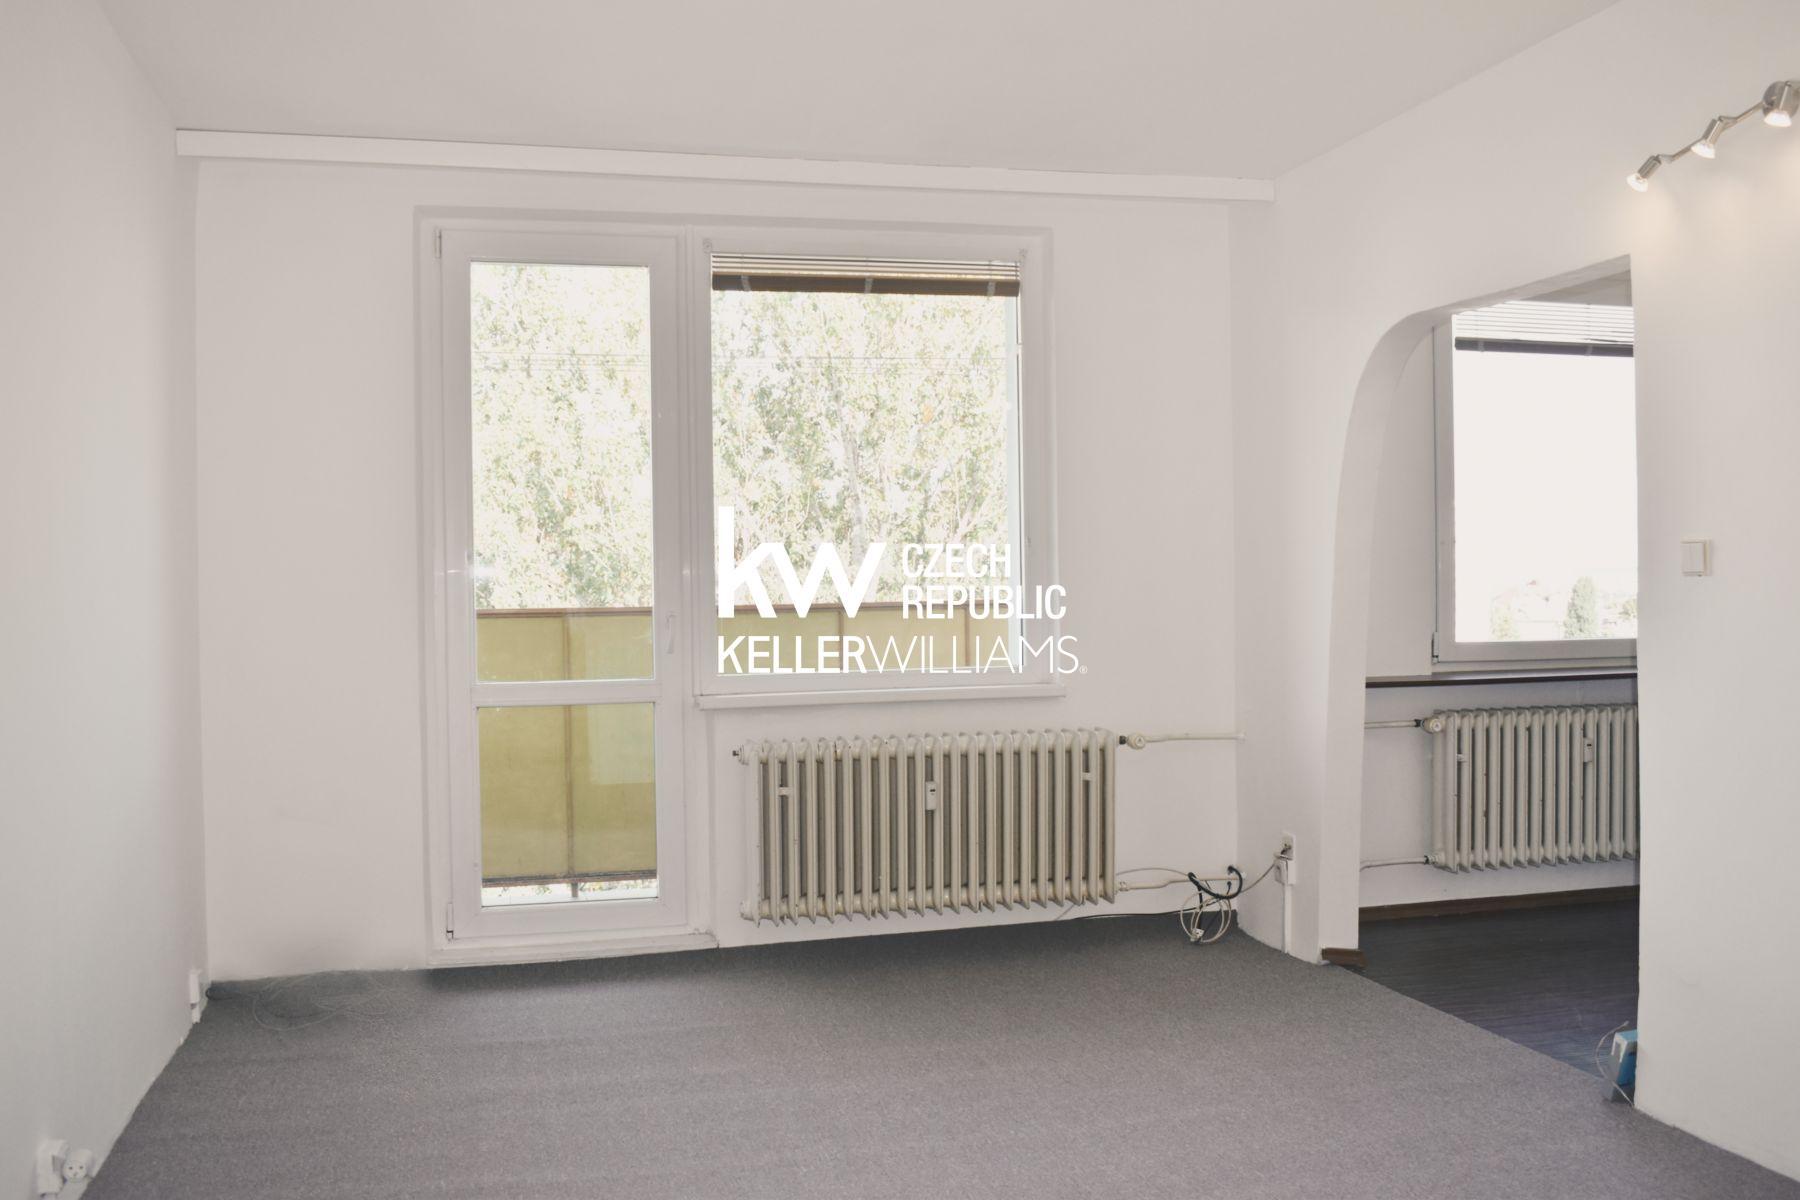 Byt 3 + 1 Olomouc Kmochova 64 m2